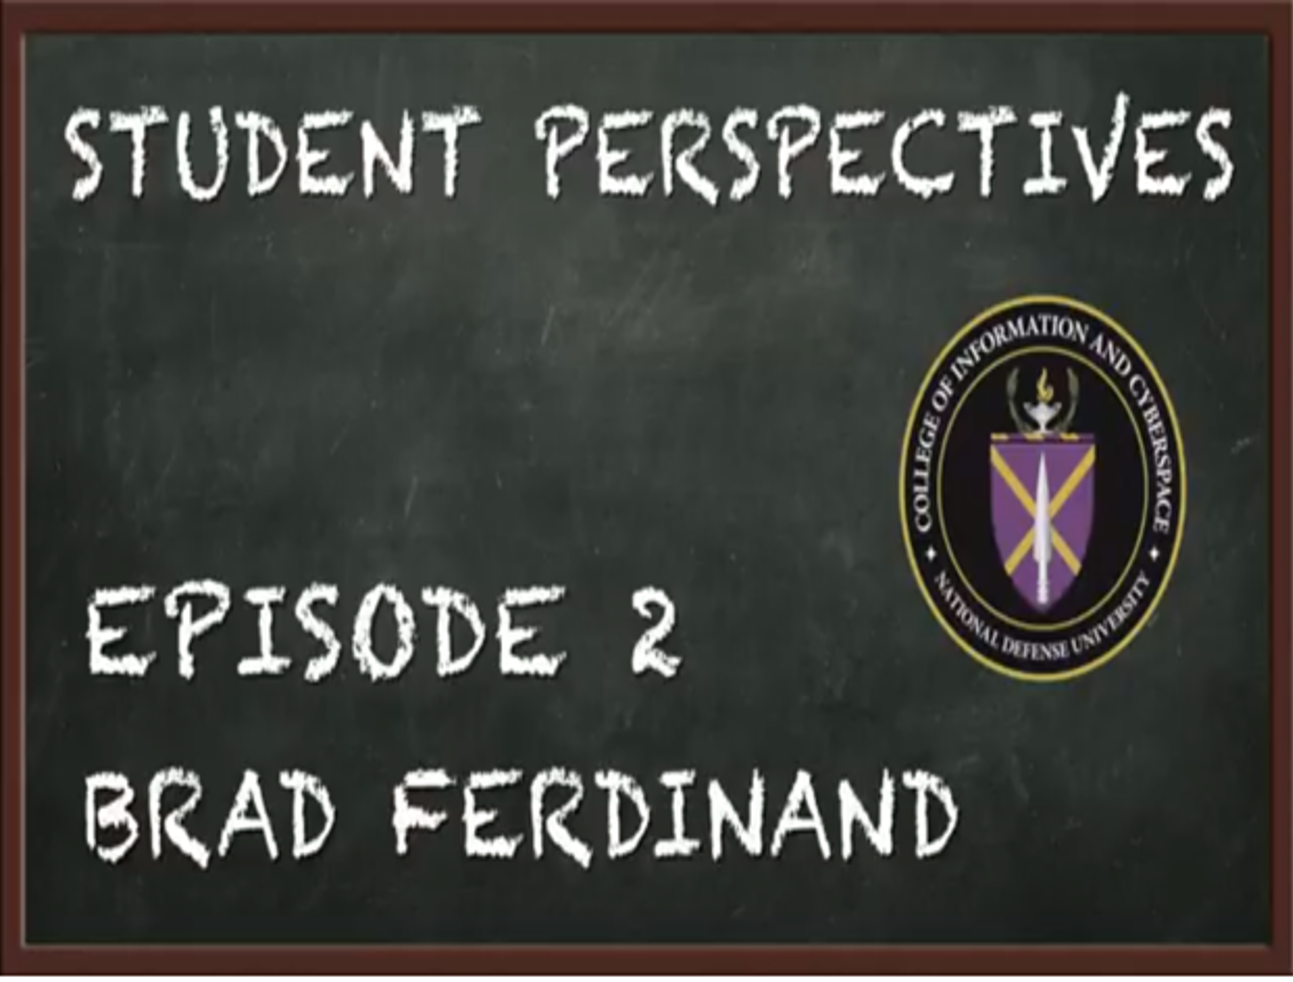 STUDENT PERSPECTIVES EPISODE 2: BRAD FERDINAND